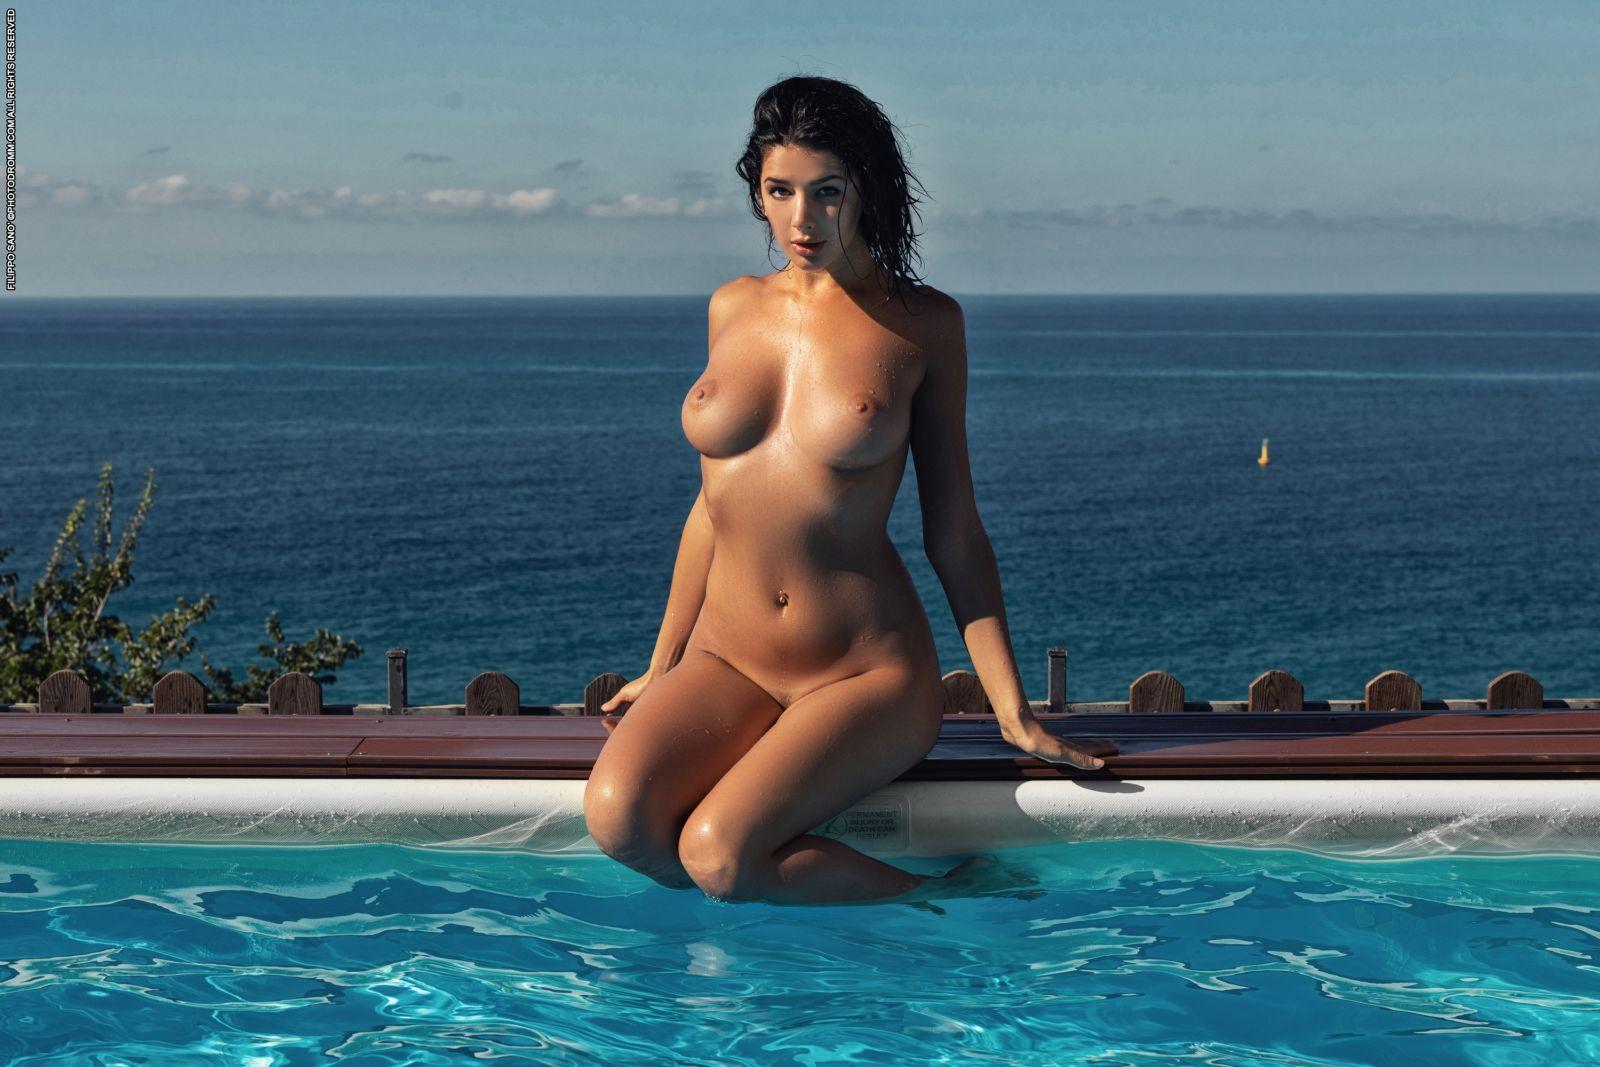 Nadine Garner Nude, Fappening, Sexy Photos, Uncensored